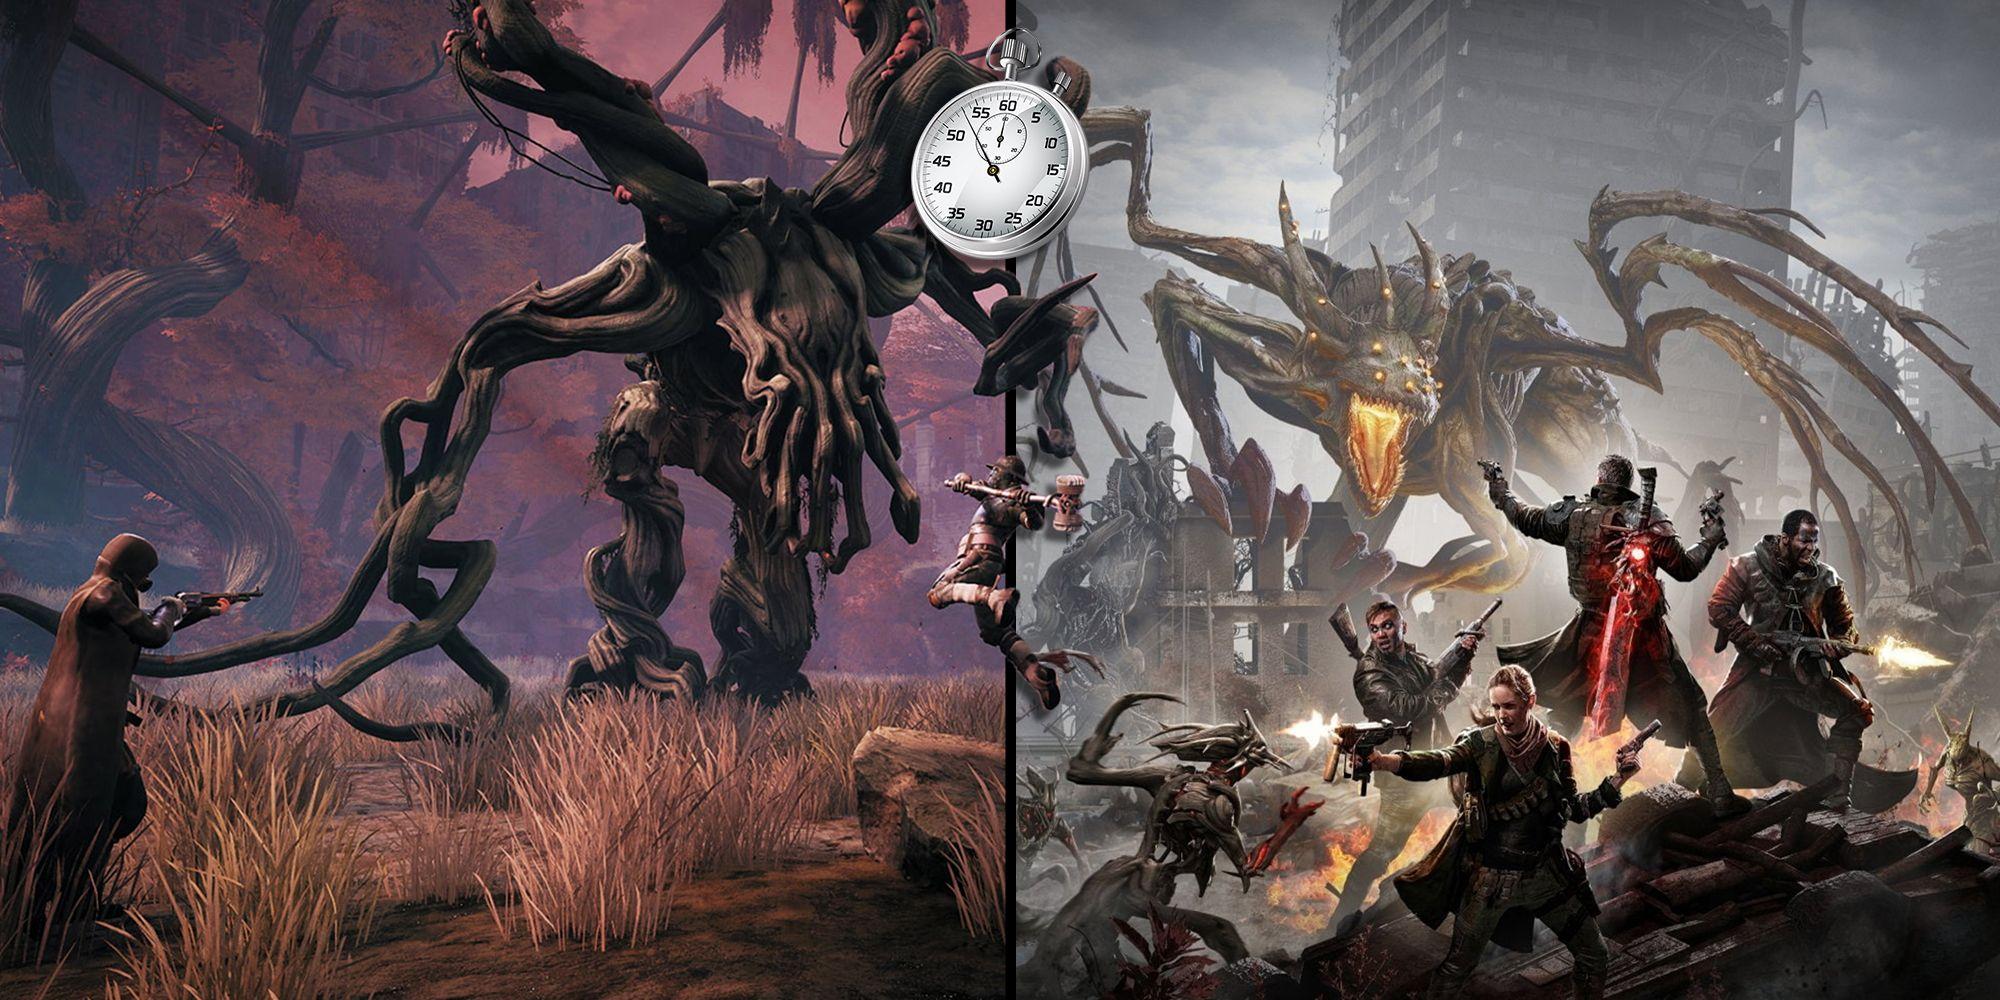 ¿Cuánto tiempo se tarda en vencer a Remnant: From the Ashes?